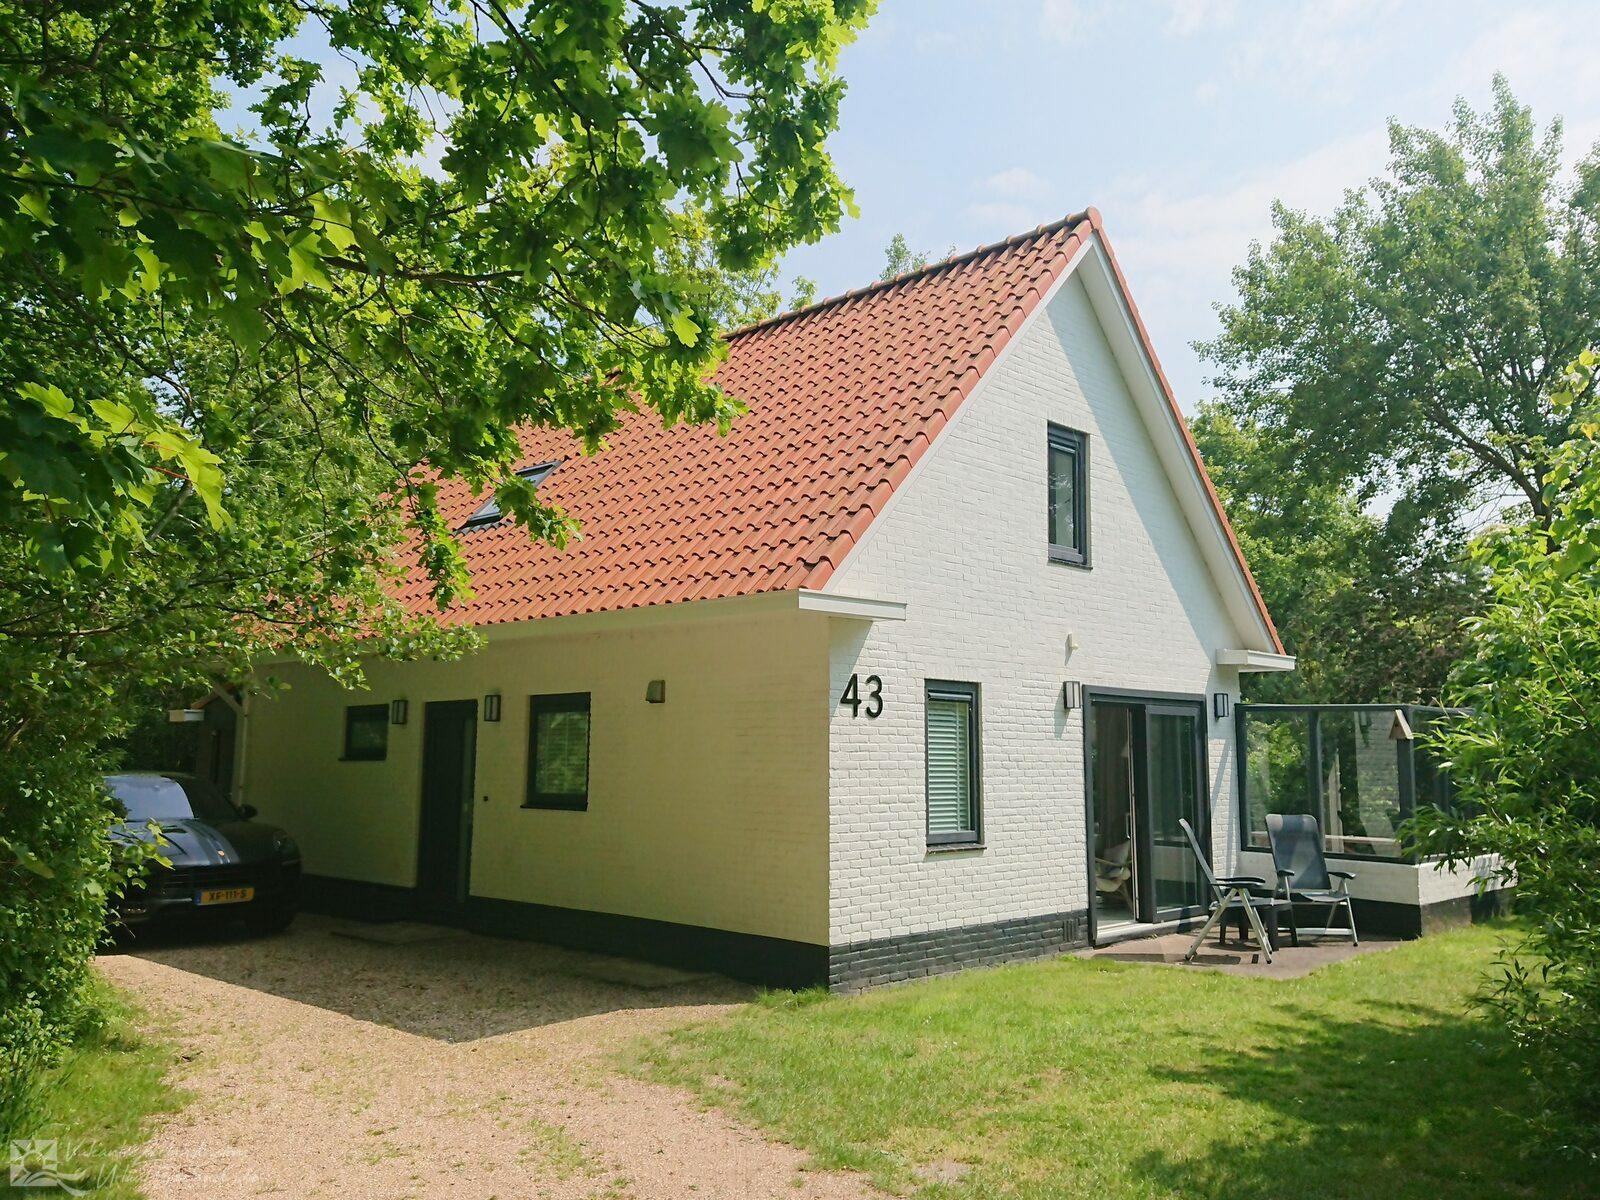 VZ906 Detached Holiday Home in Koudekerke